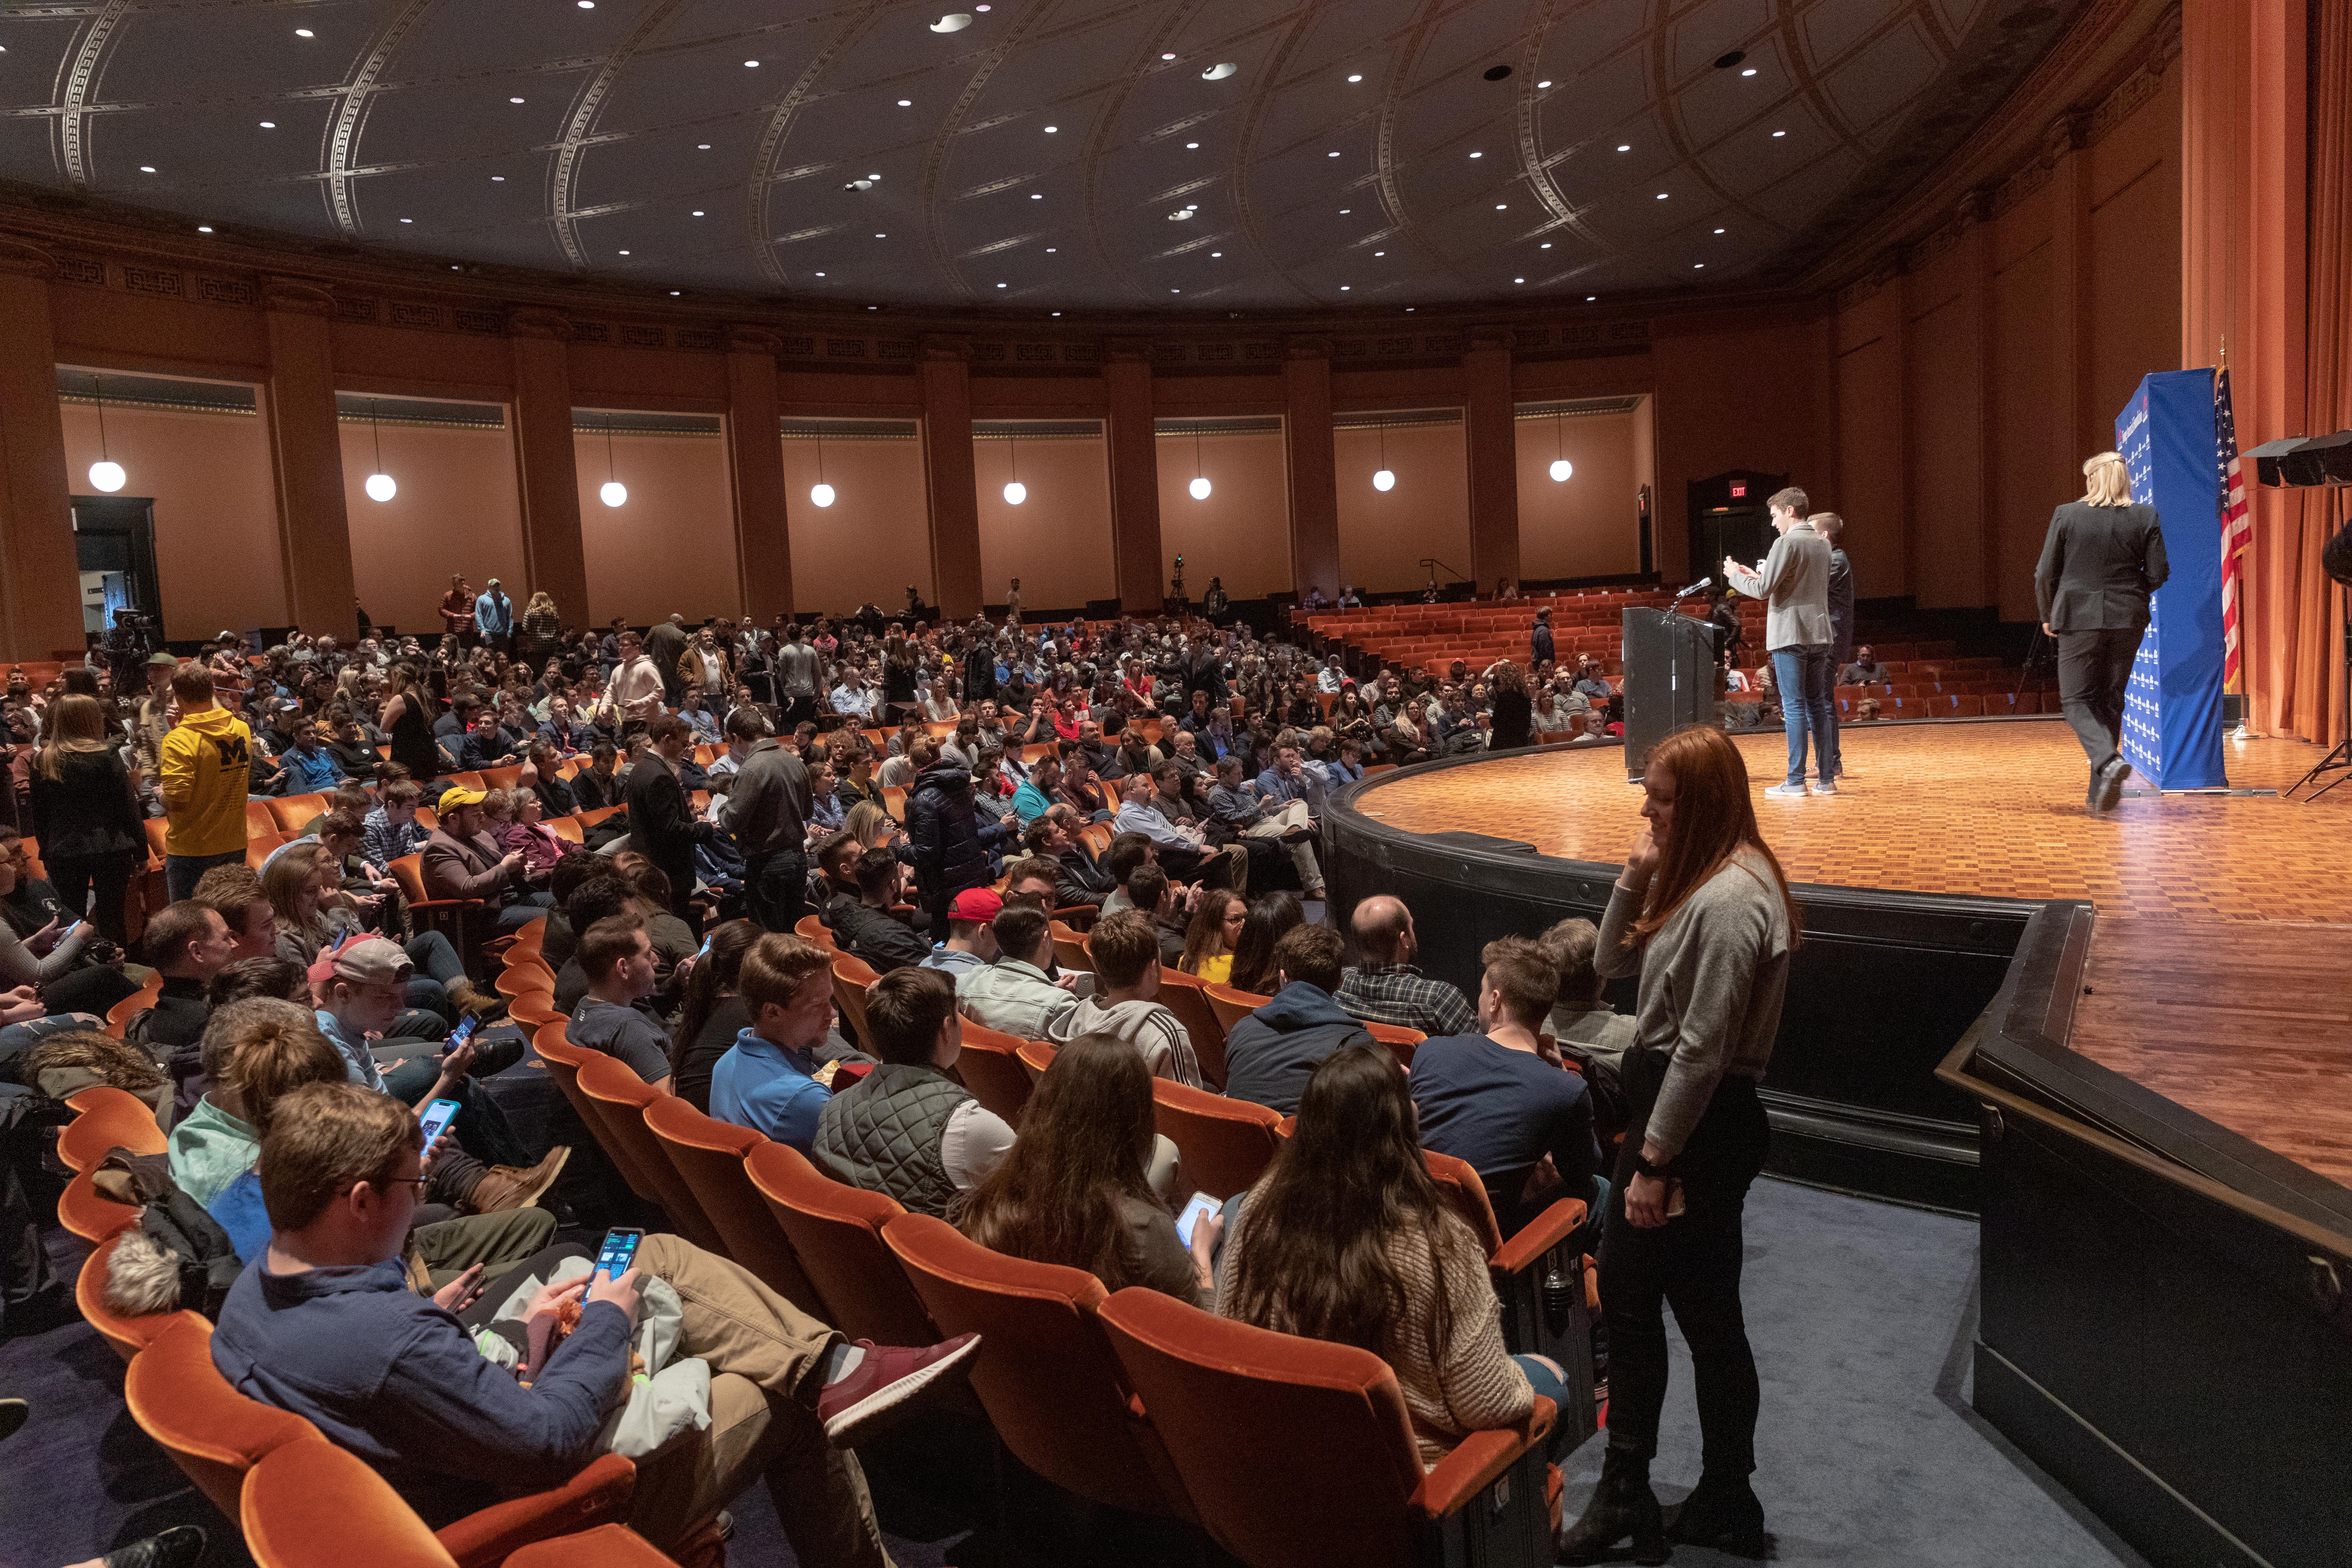 Ben Shapiro at The George Washington University